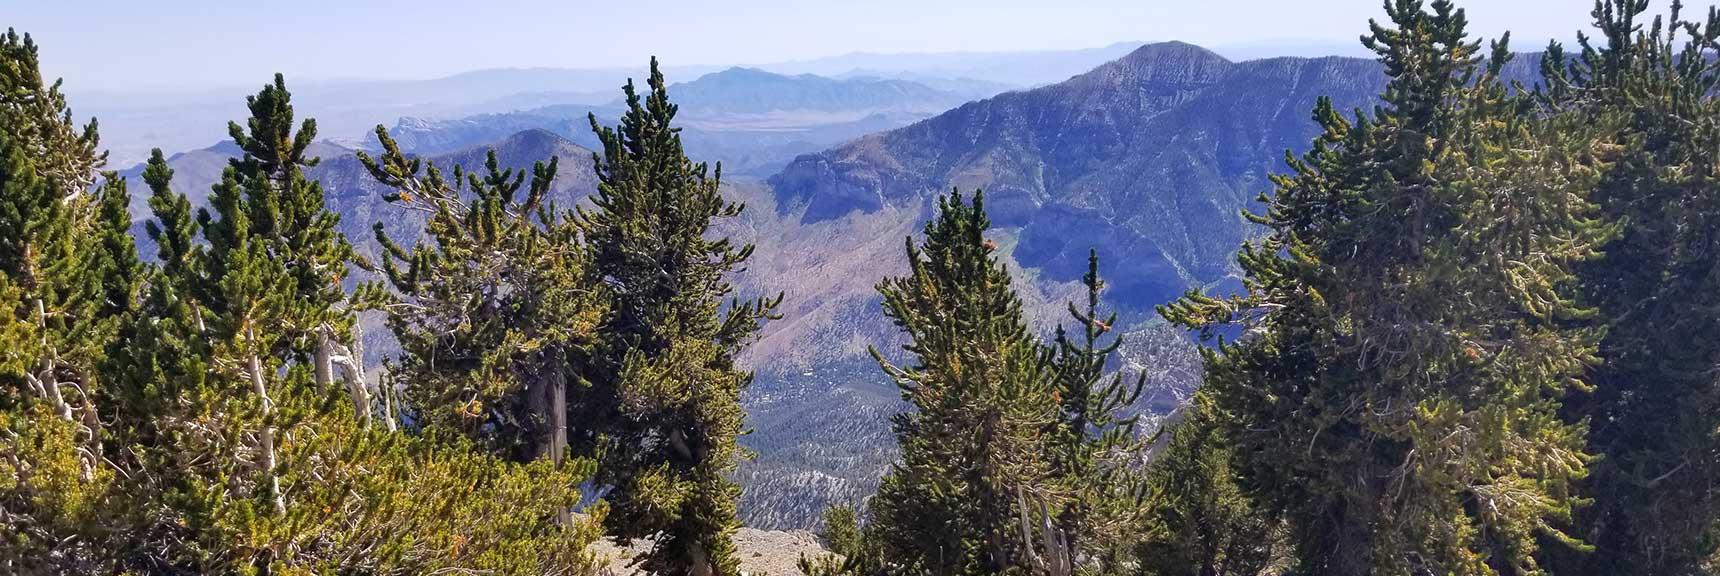 View from Mummy Mt Summit, Nevada